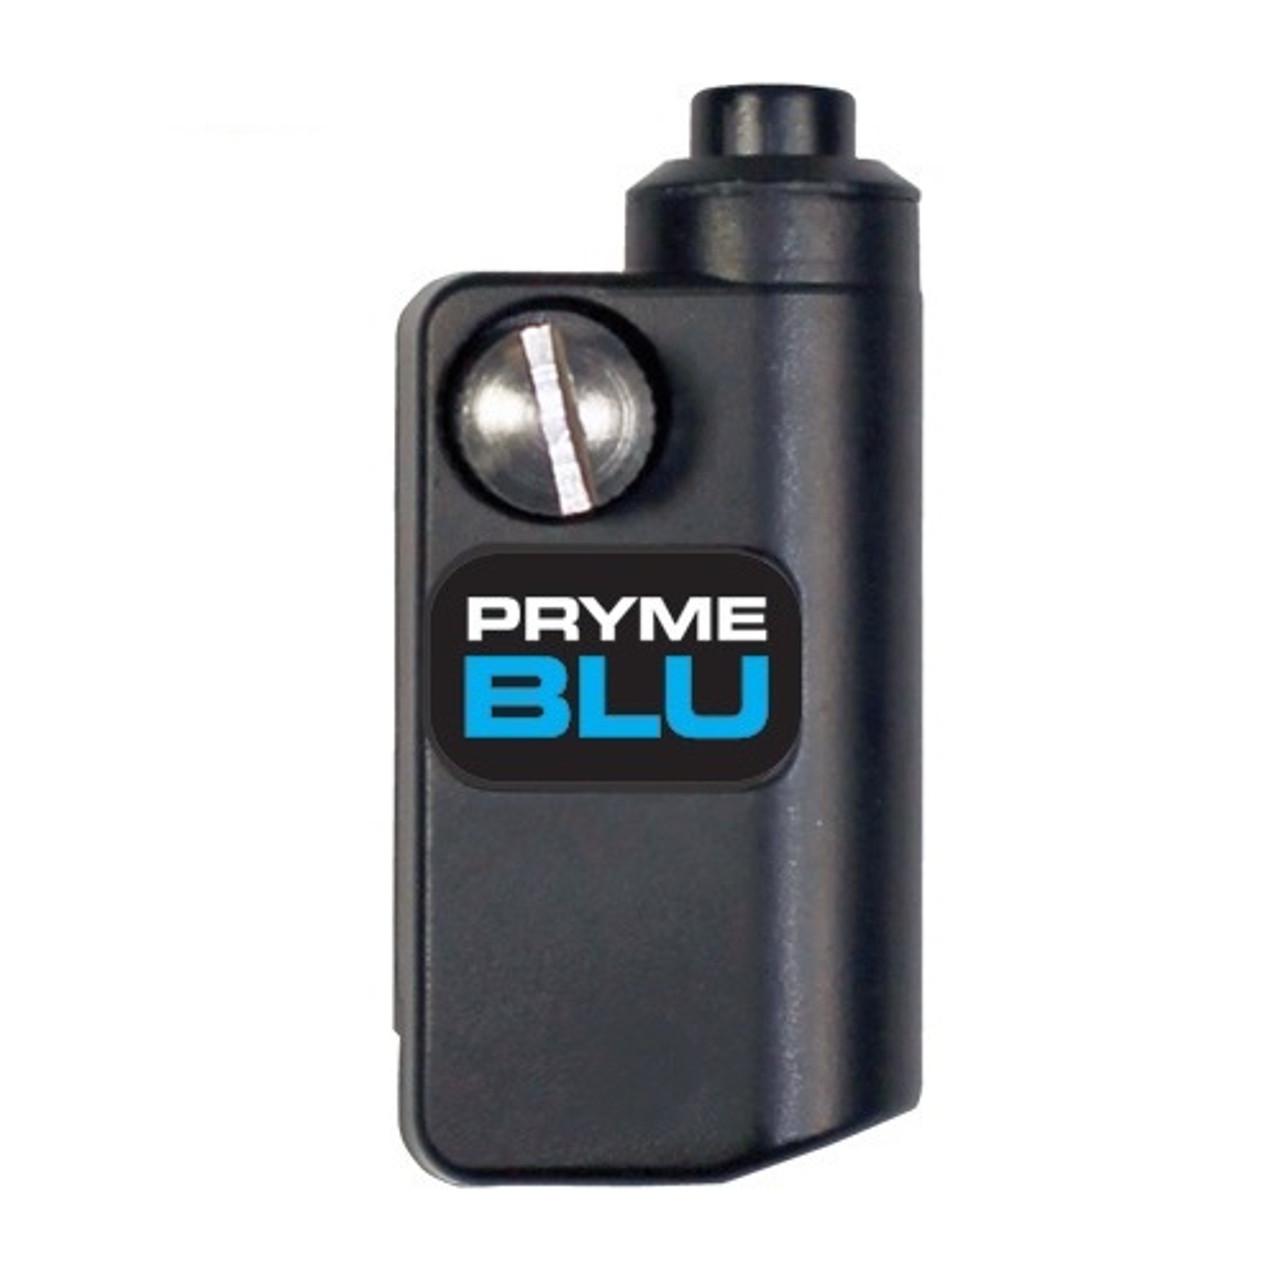 PRYME BLU BT-520 ICOM Bluetooth Adapter